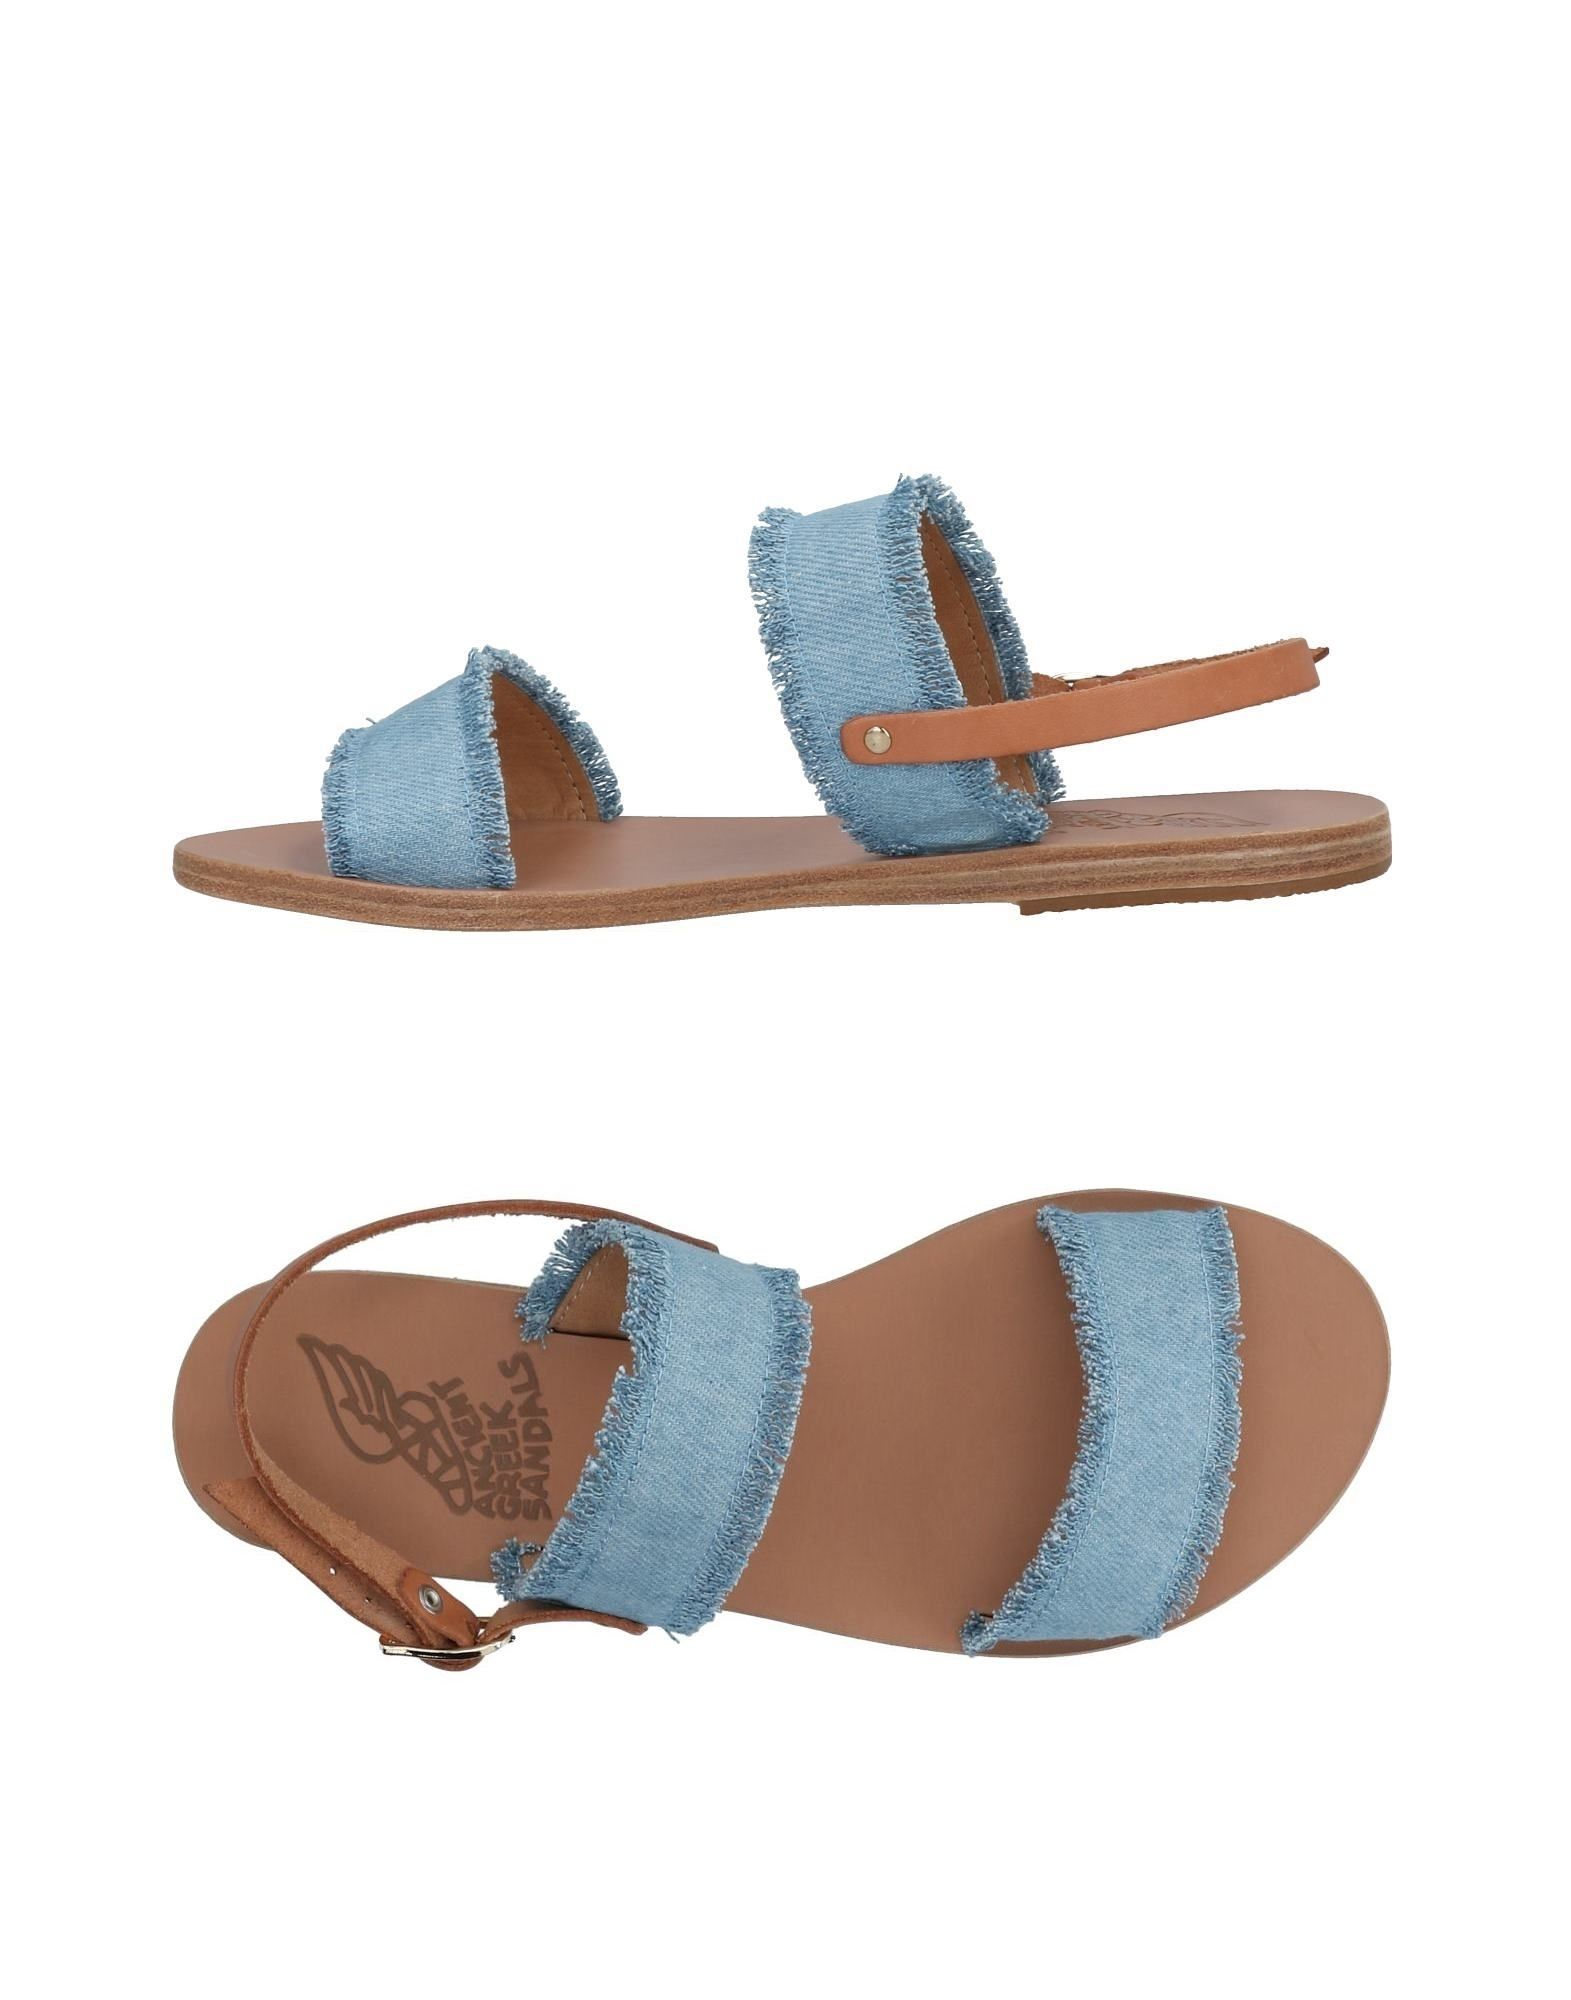 ANCIENT GREEK SANDALS Сандалии xda 2018 new summer sandals women flat shoes bandage bohemia leisure lady casual sandals peep toe outdoor fashion sandals f171